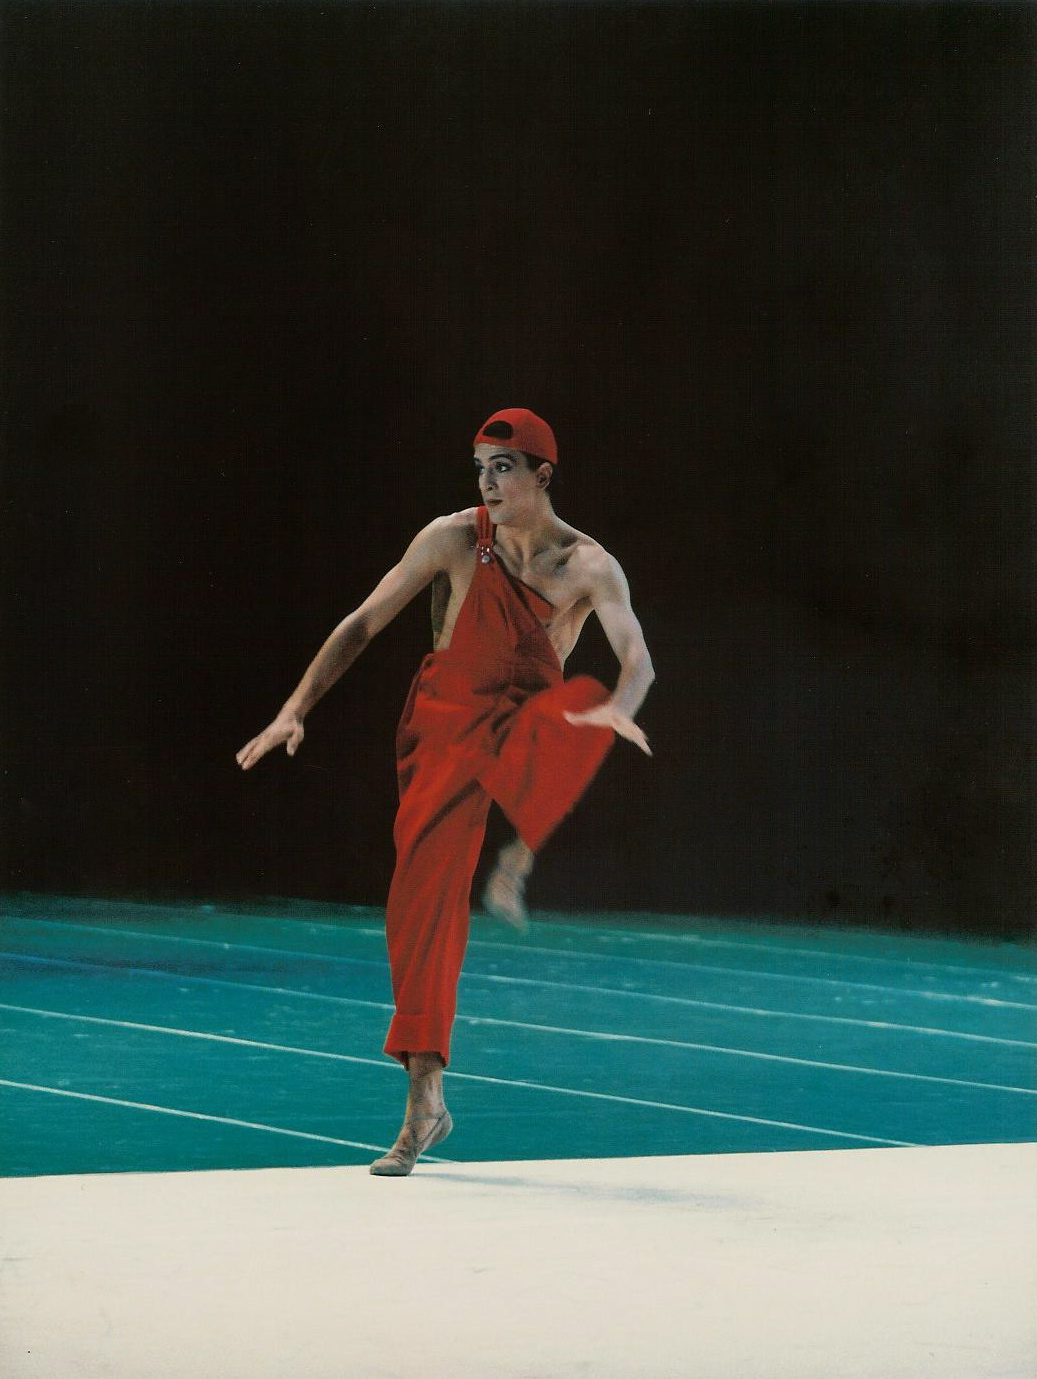 SYLVIA - Amour - Orion - J.Moatti